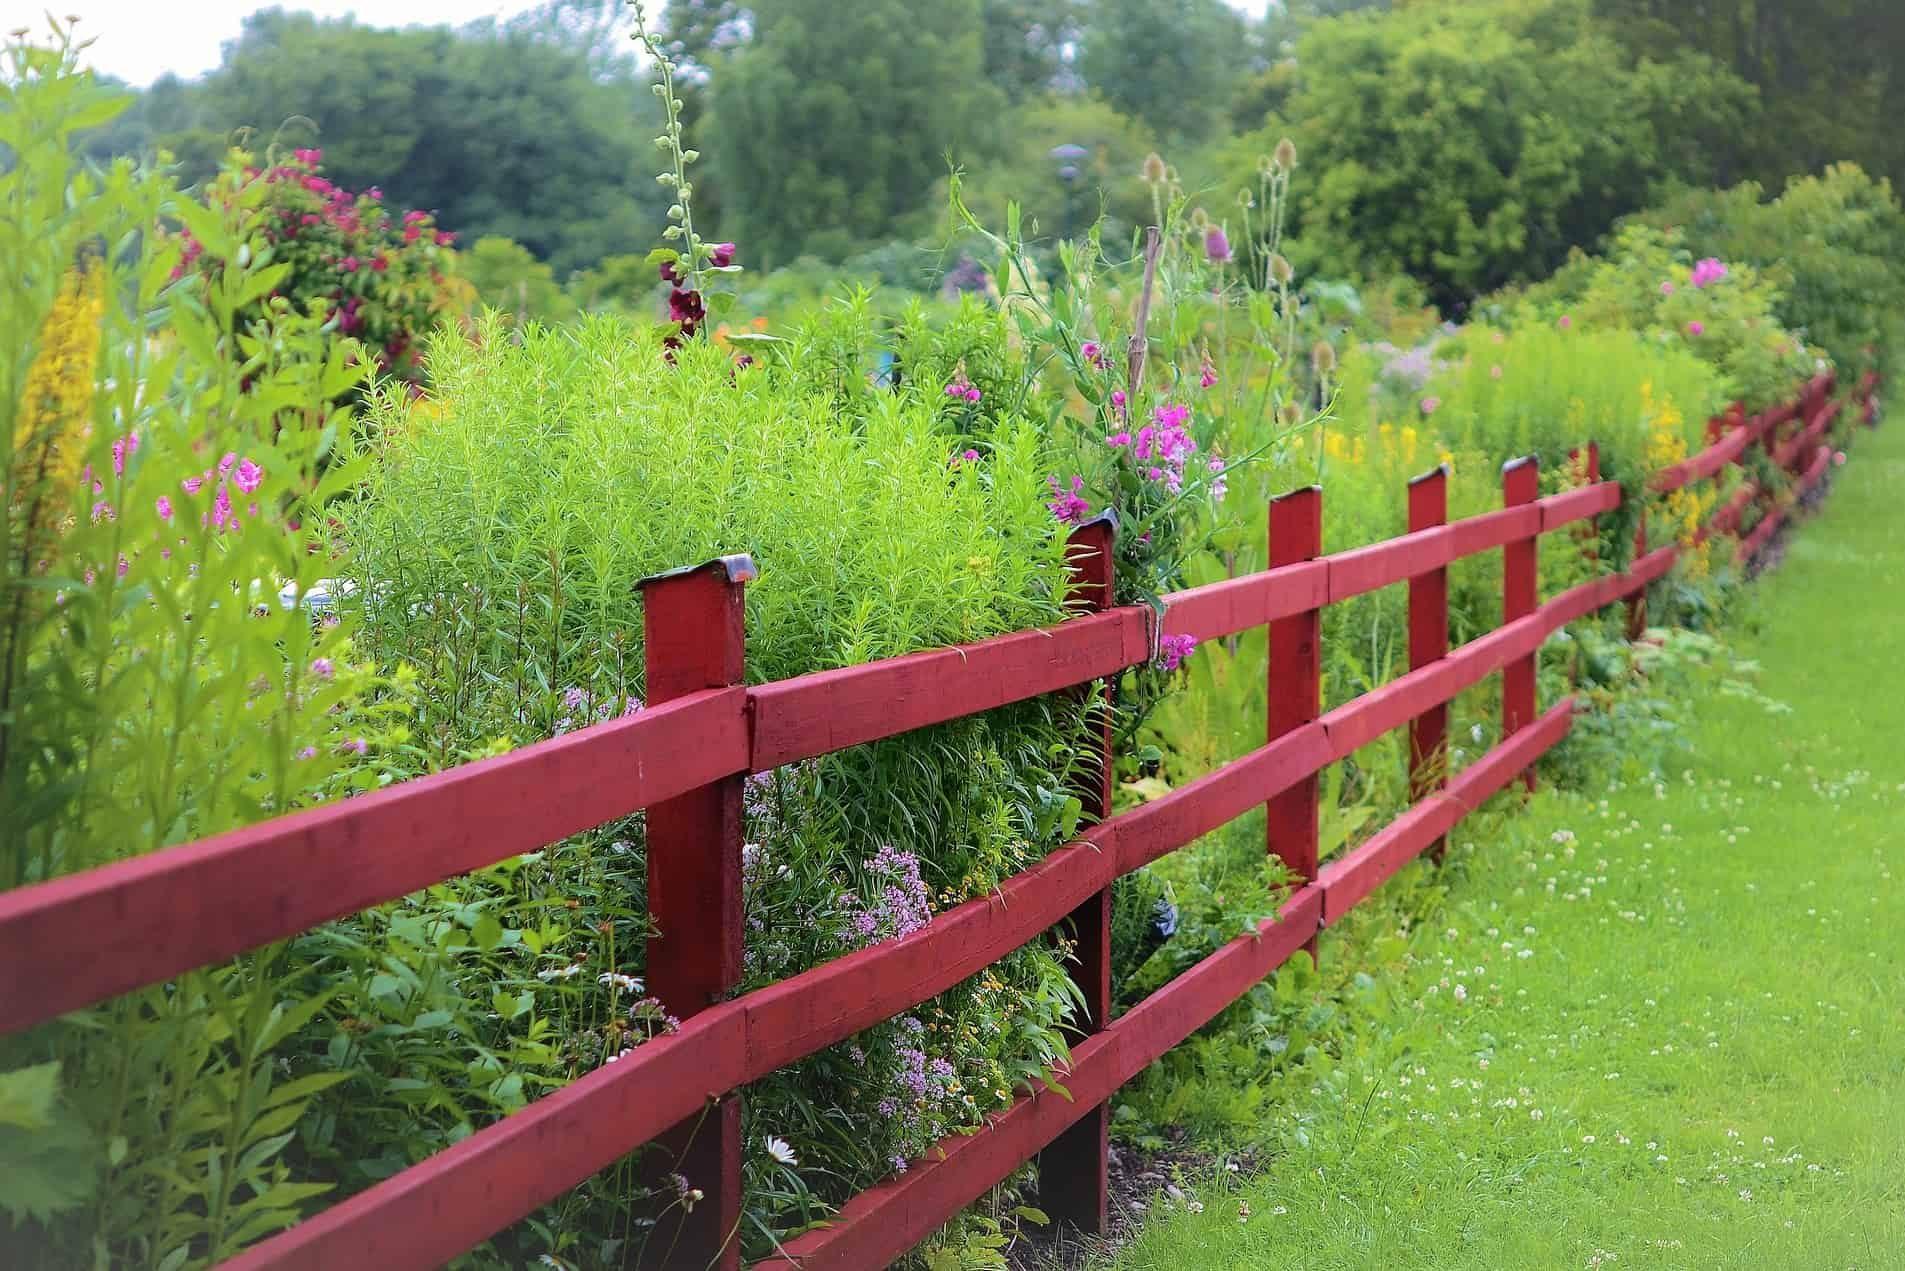 20 Diy Garden Fence Ideas That Will Make Your Garden Irresistible Finding Good Living